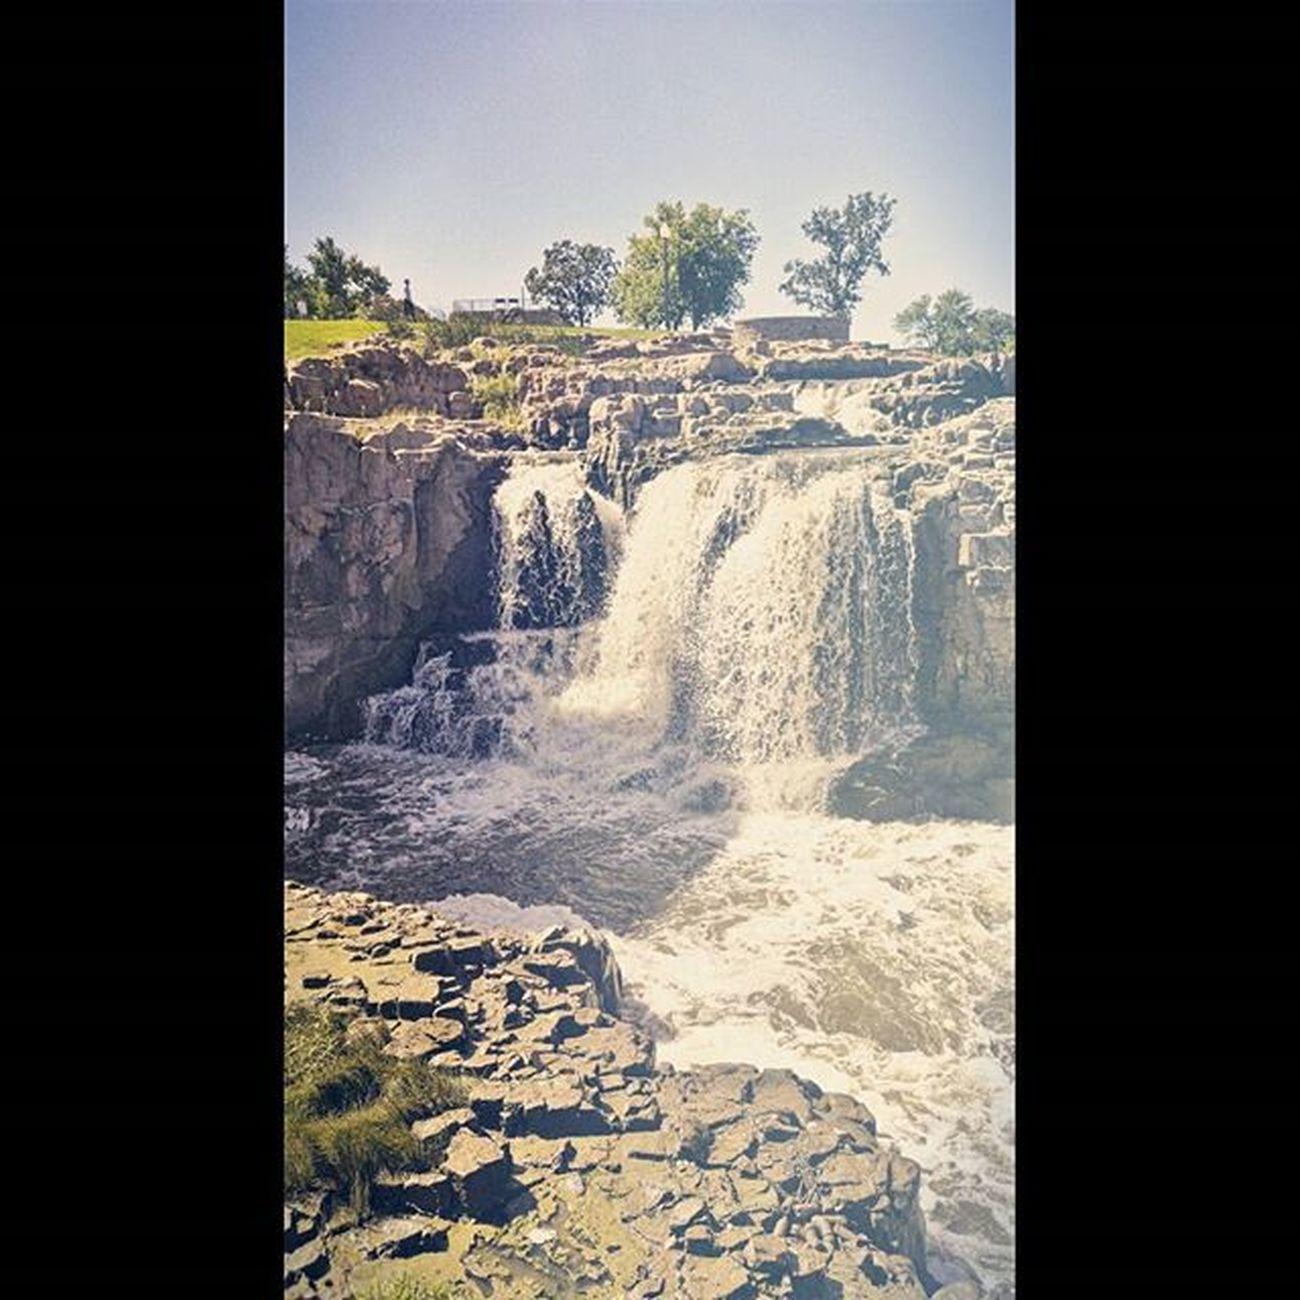 It's always fun to return to my old stomping grounds. Siouxfalls Southdakota Hifromsd Fallspark waterfalls mist beautyiseverywhere favoriteplaces stompinggrounds fallsinlove